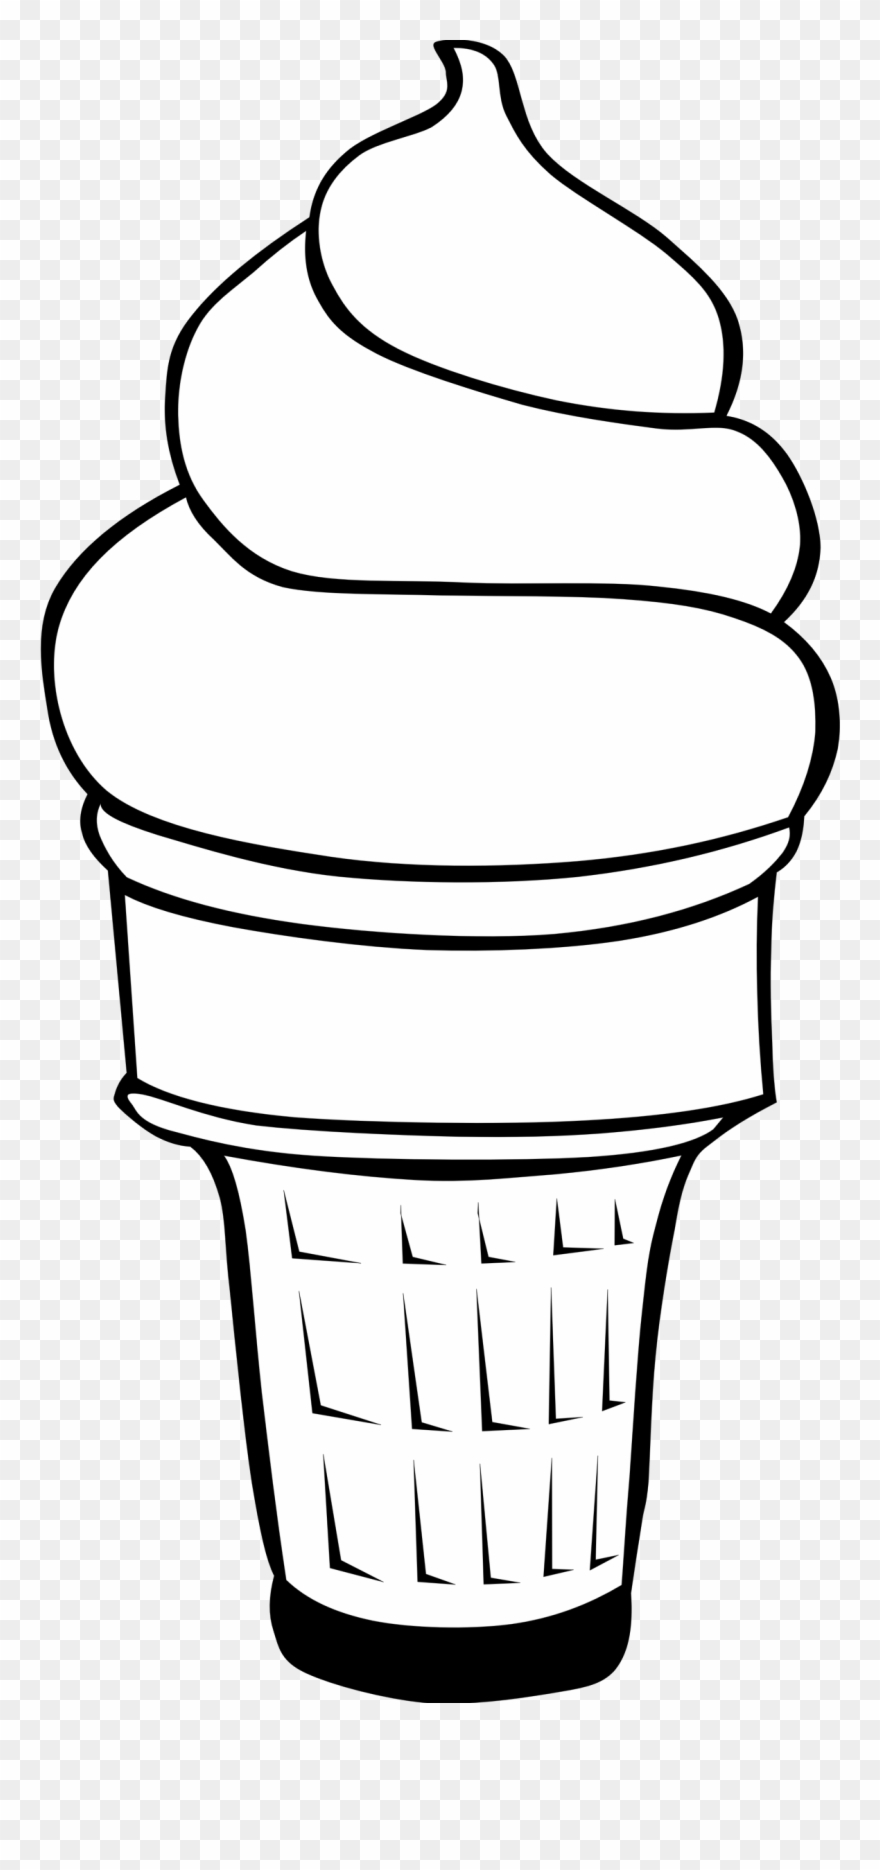 880x1870 Ice Cream Cone Line Drawing Tree Silhouette Clip